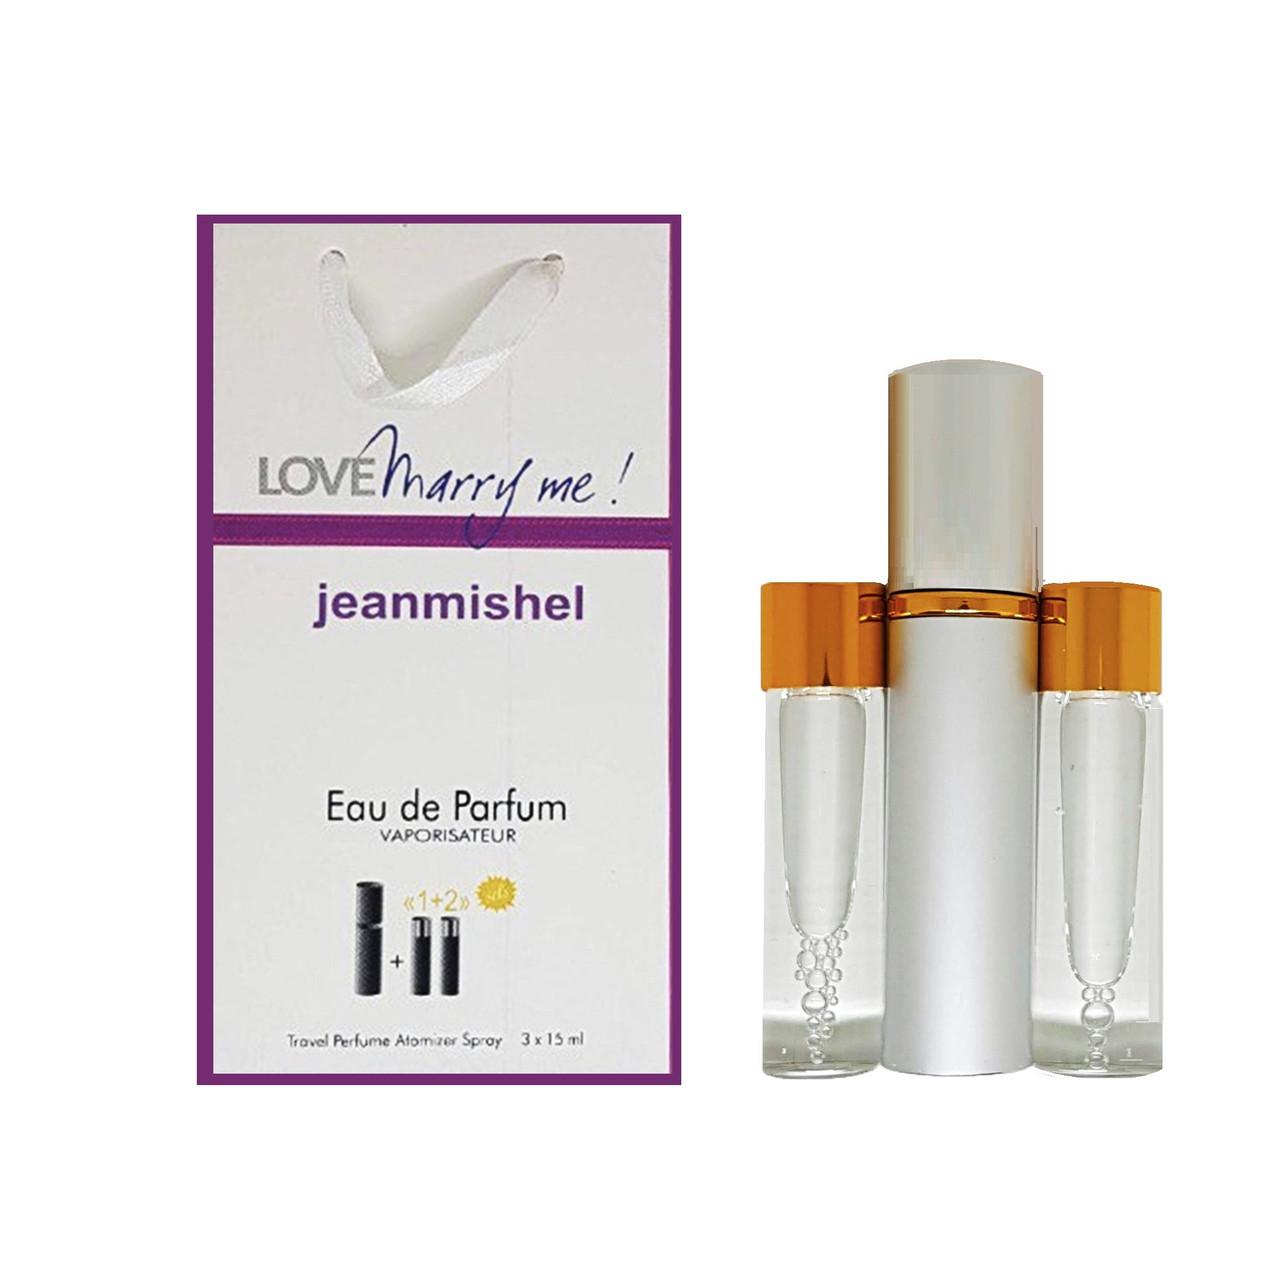 Jeanmishel Love Marry me (52) 3 x 15 ml